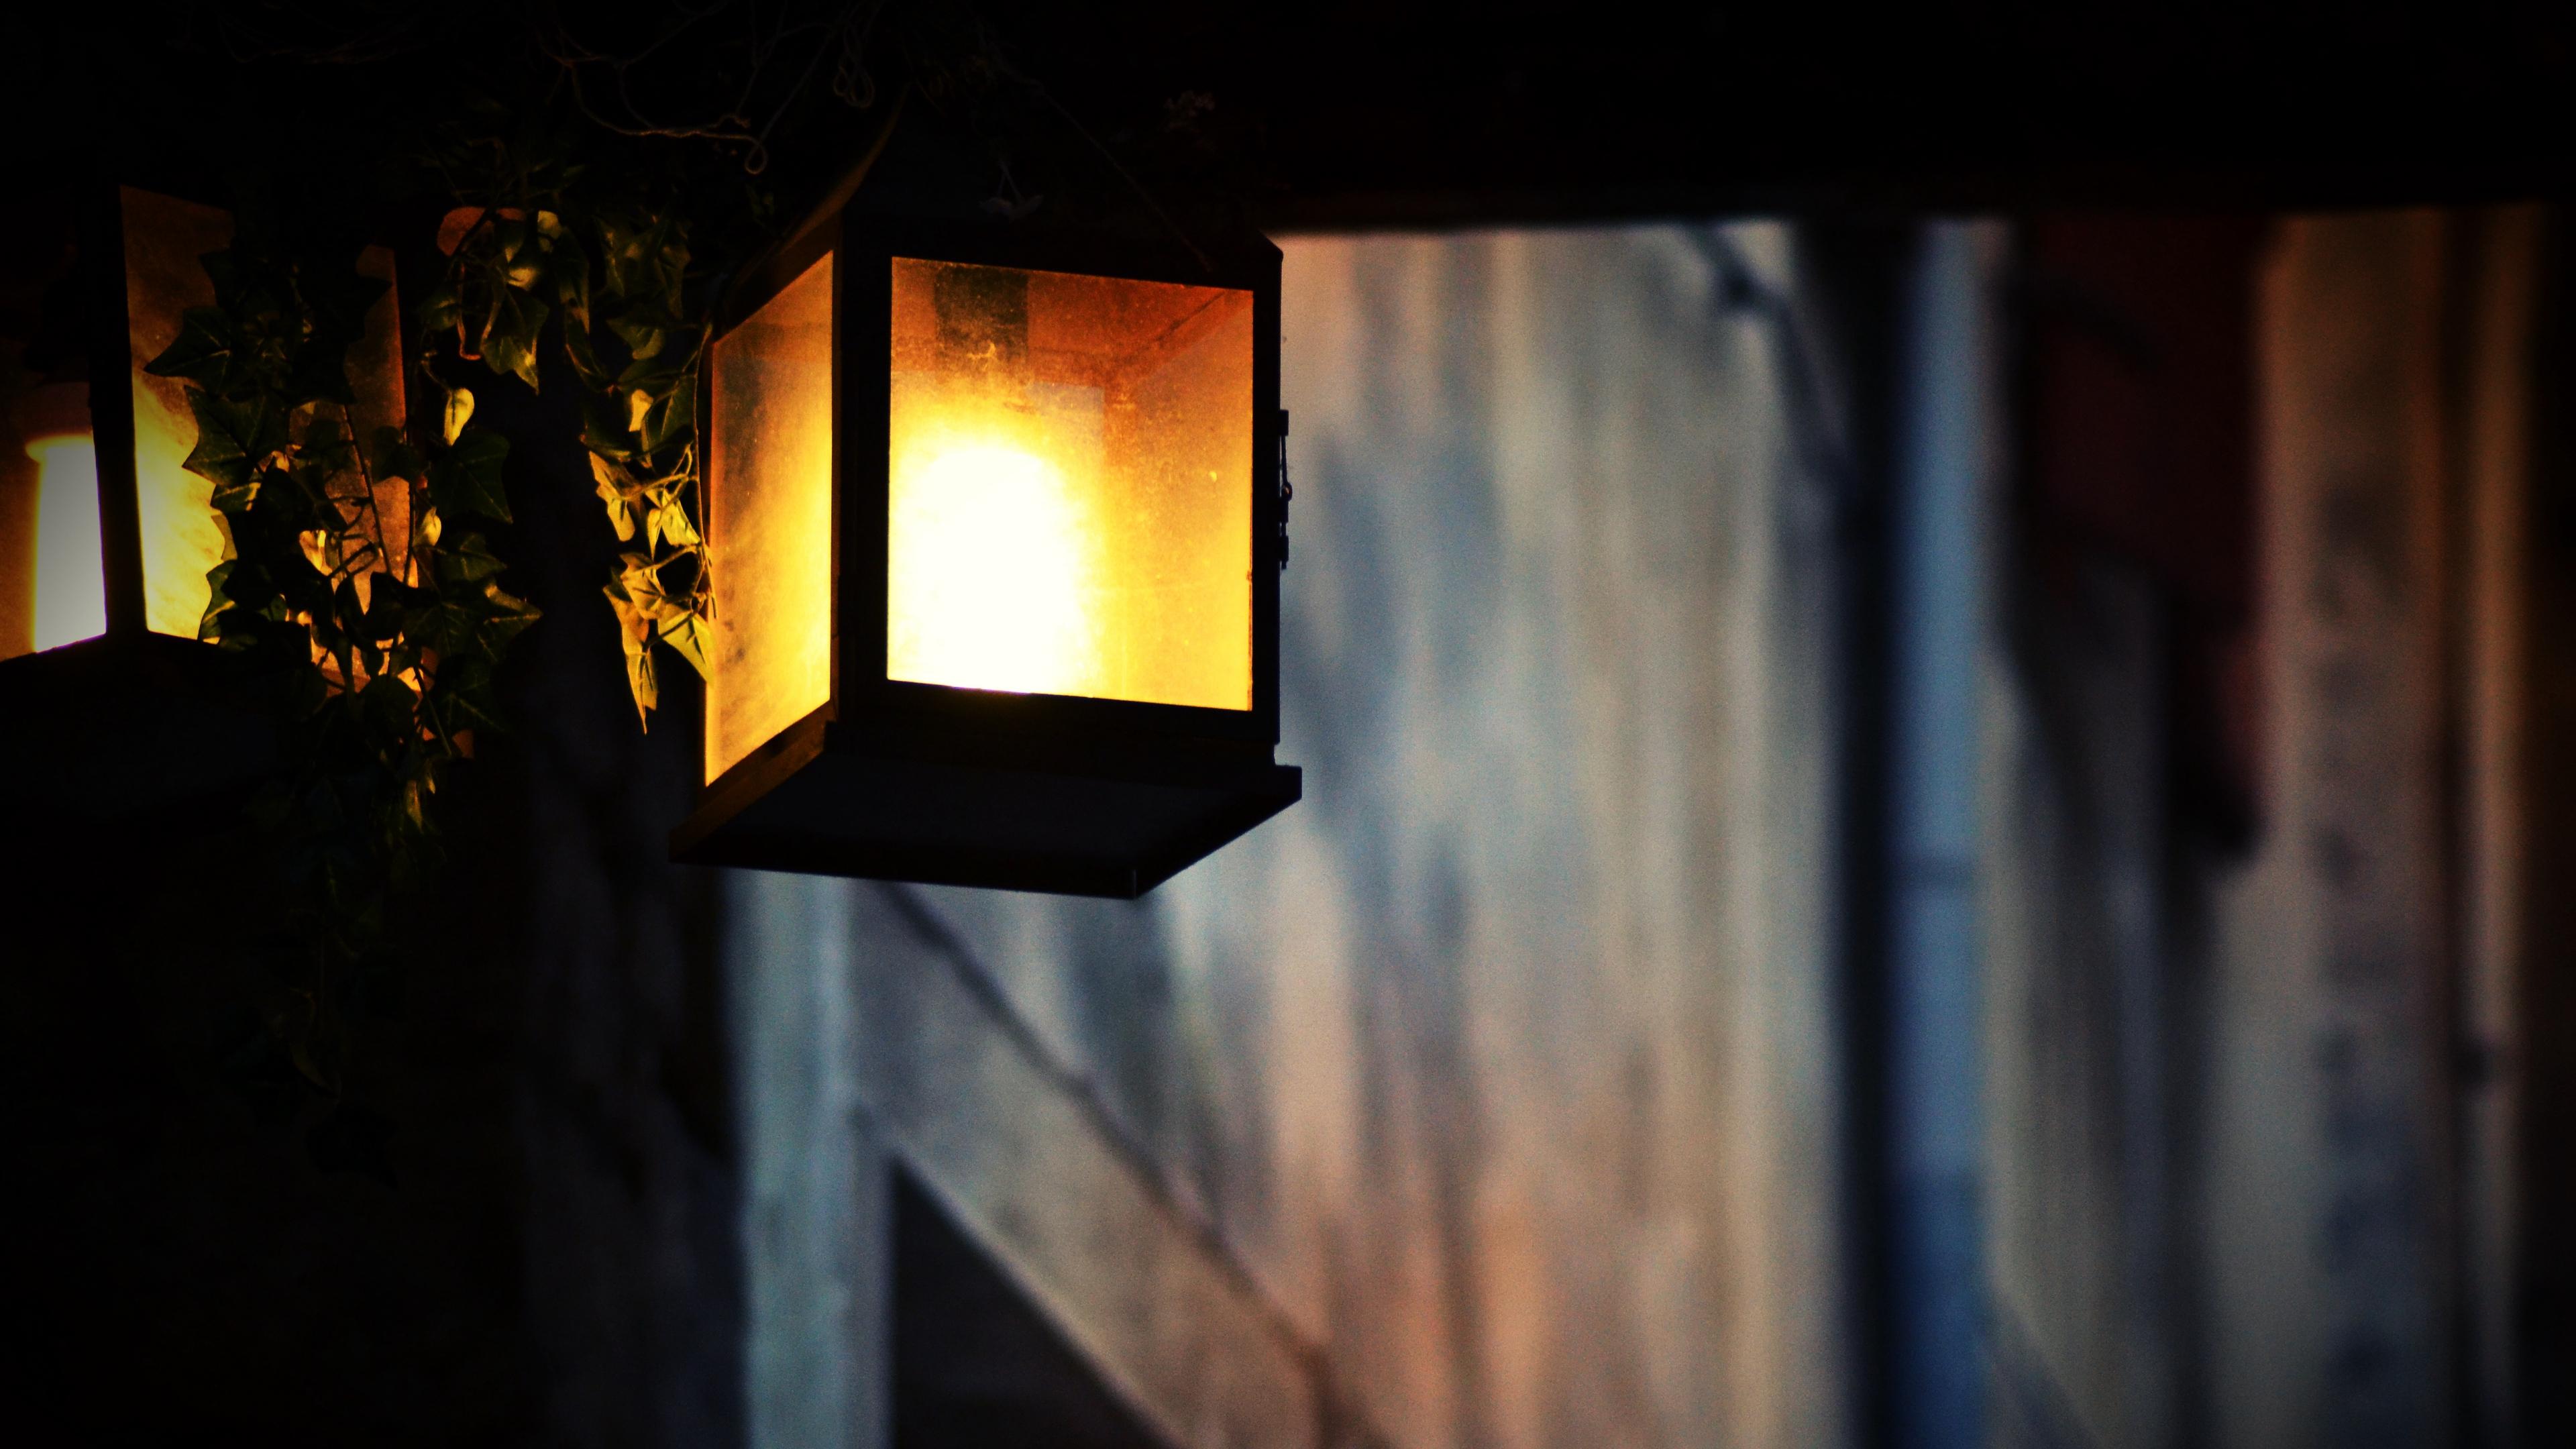 lantern light electricity lighting 4k 1540574384 - lantern, light, electricity, lighting 4k - Light, lantern, electricity